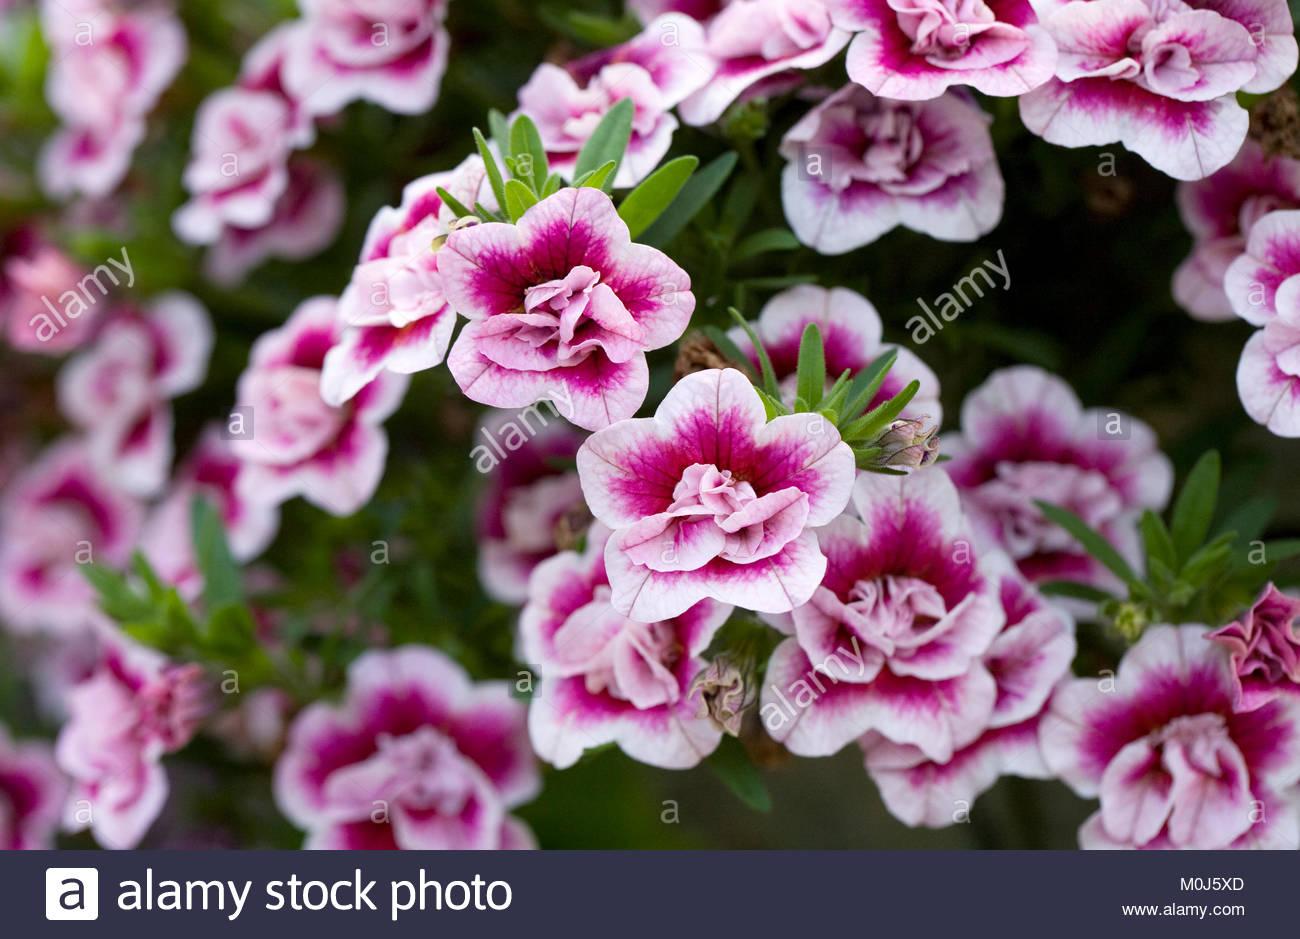 Calibrachoa 'MiniFamous Double PinkMania' flowers. - Stock Image